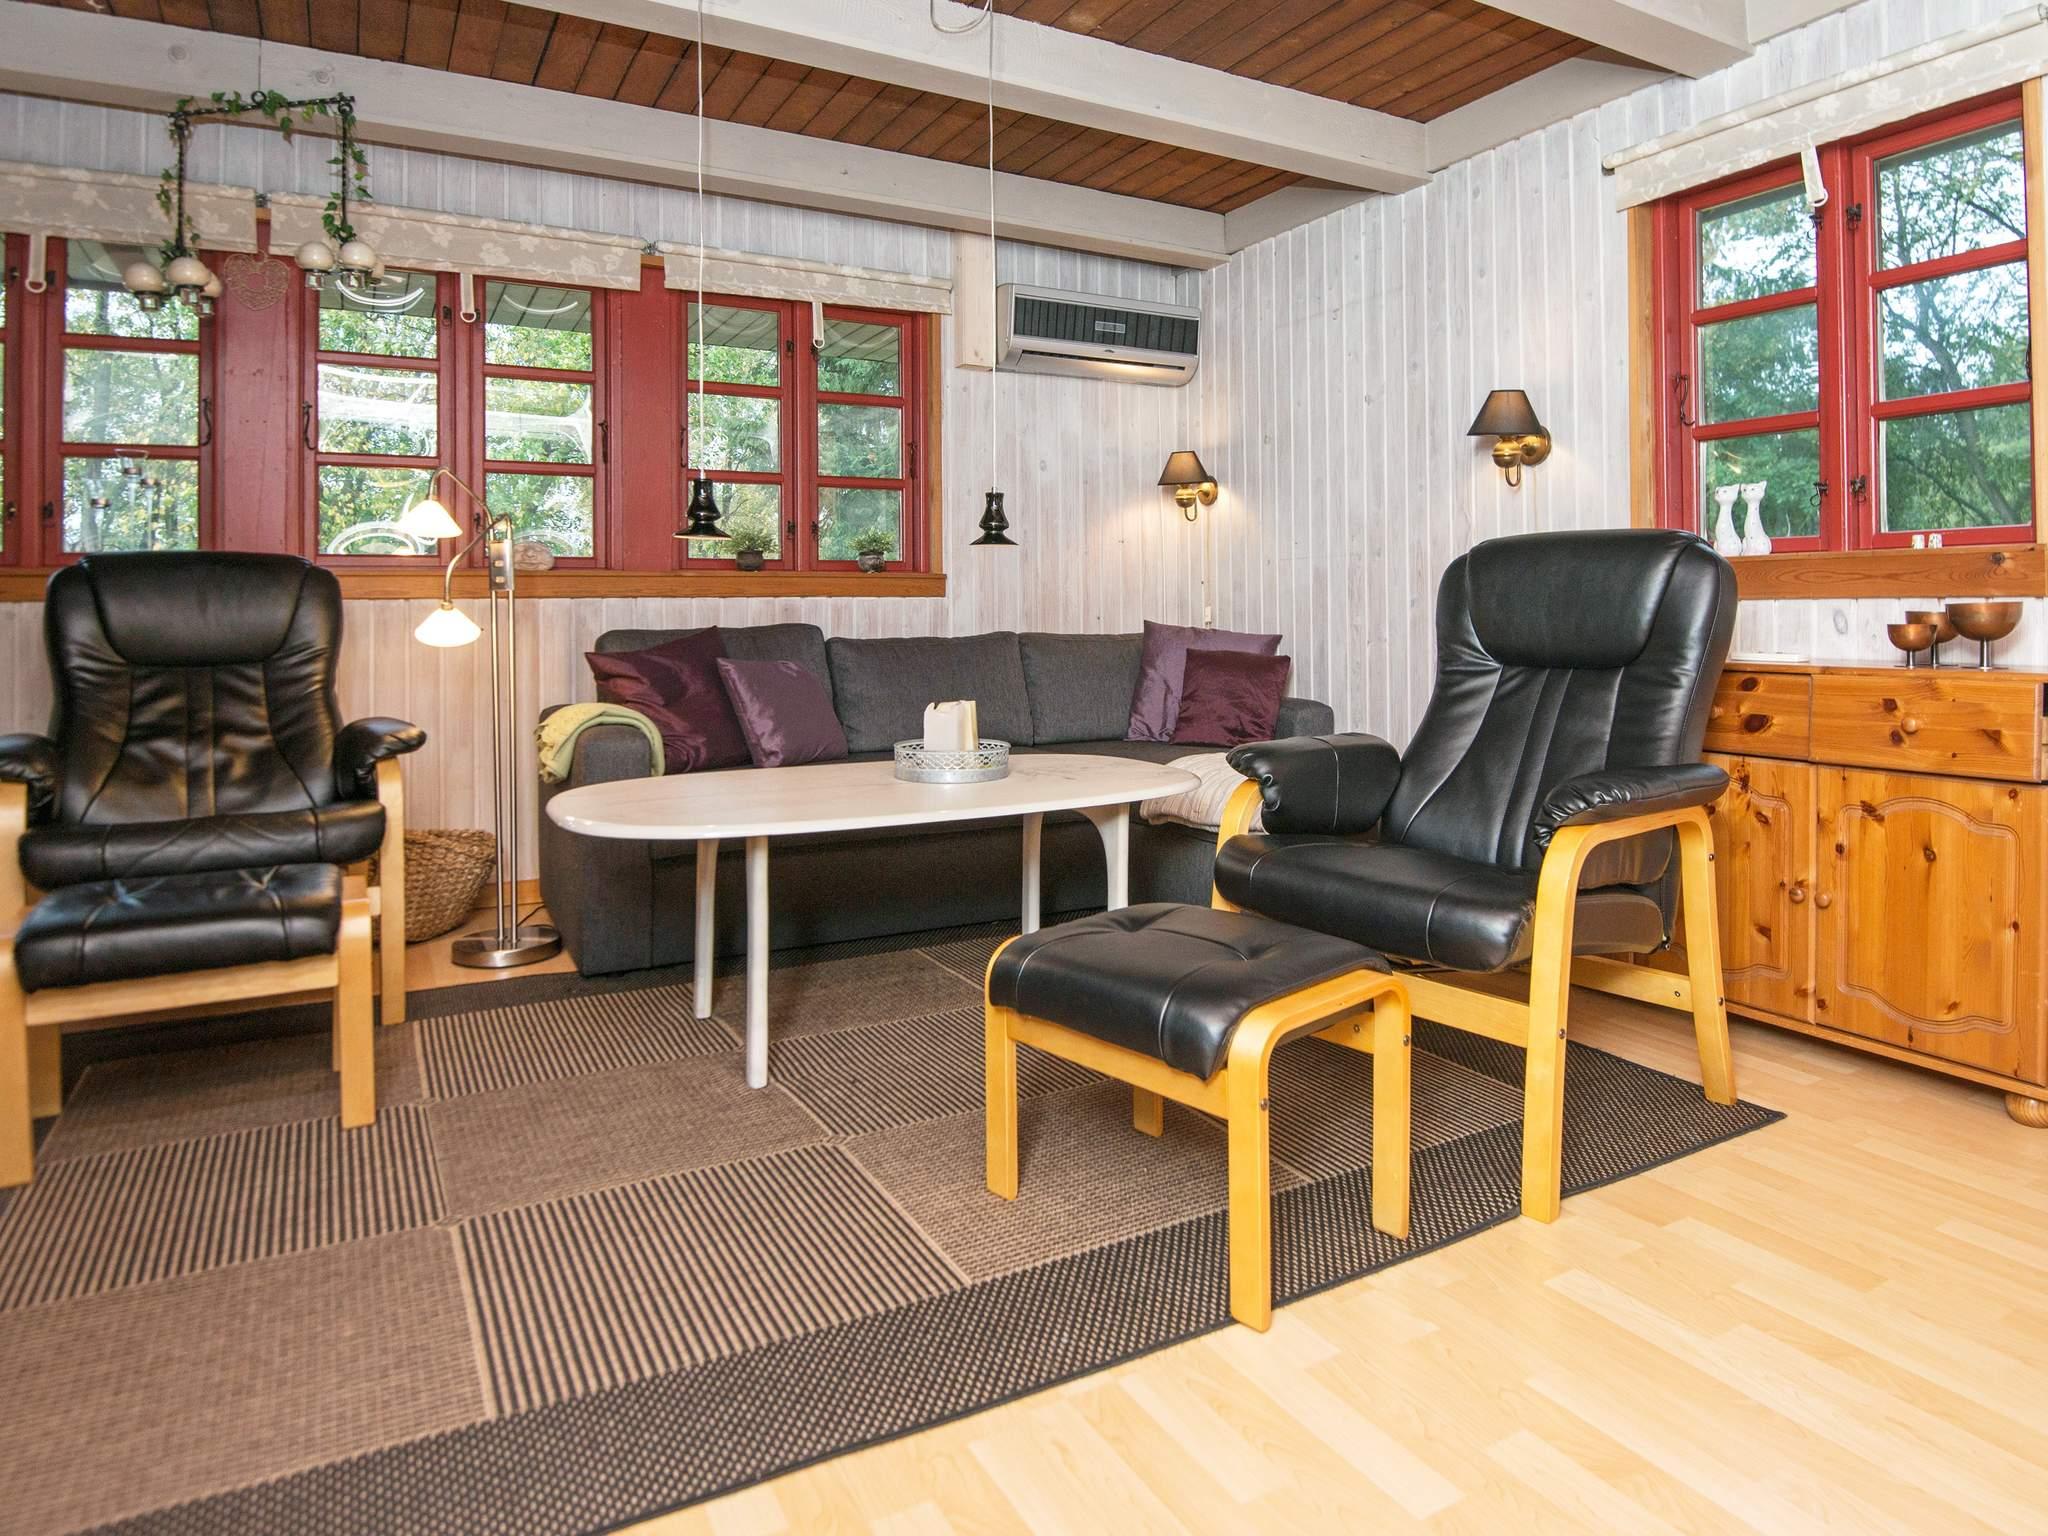 Ferienhaus Arrild (306971), Arrild, , Südwestjütland, Dänemark, Bild 2